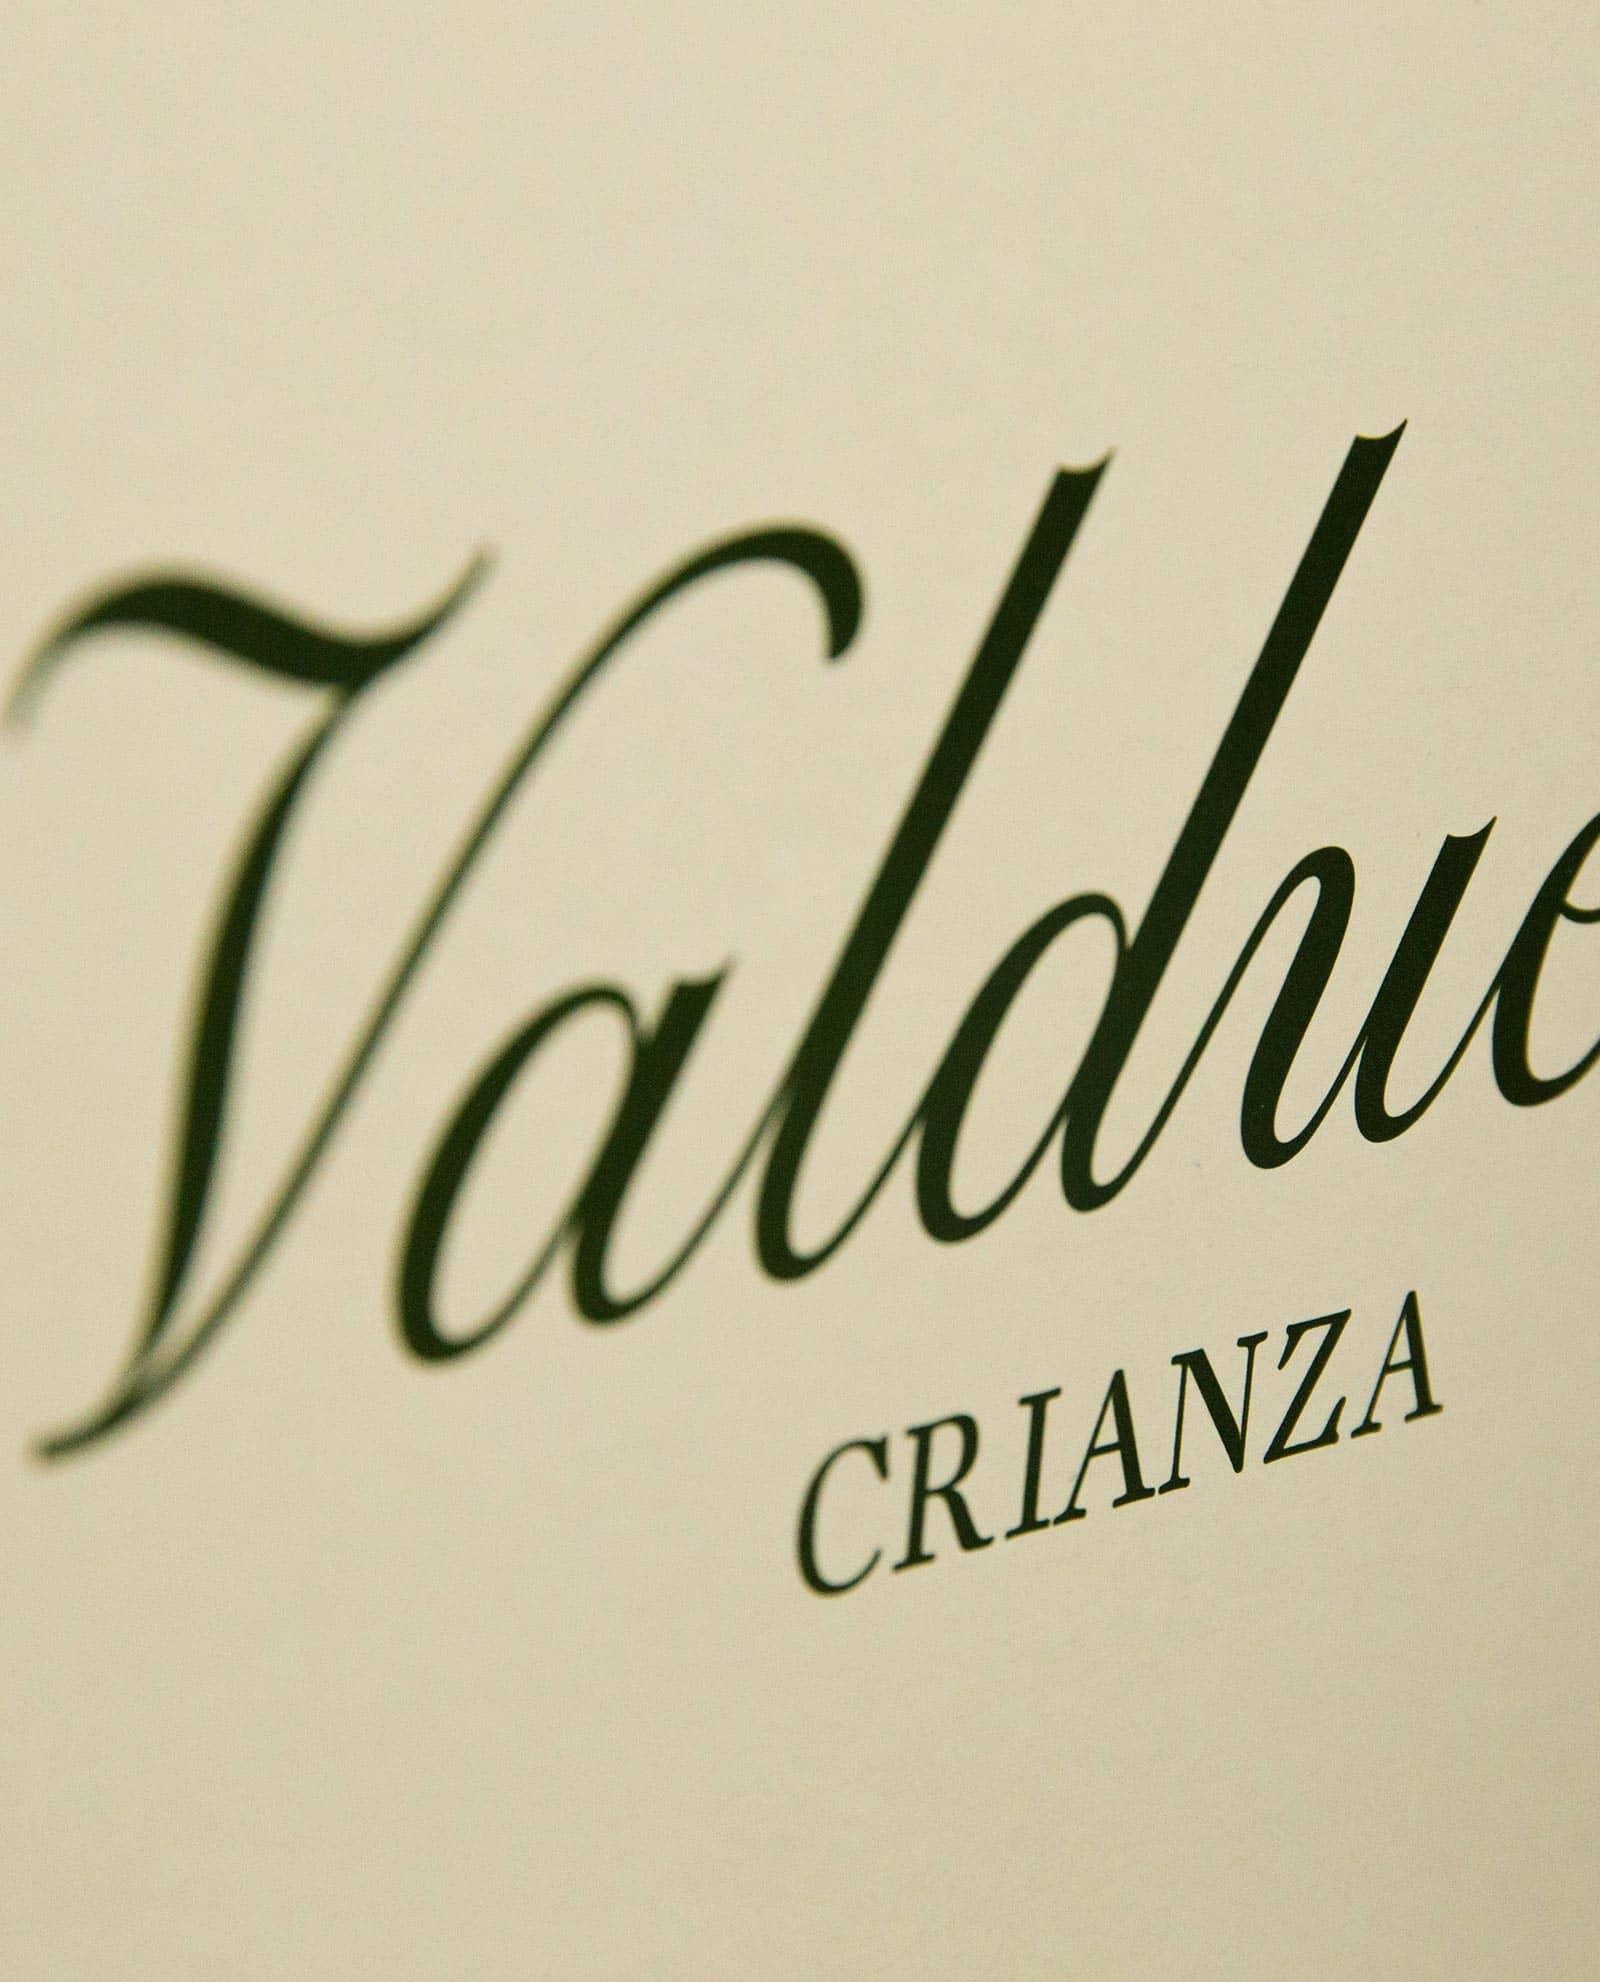 Detalle caja de 6 botellas de Valduero Crianza